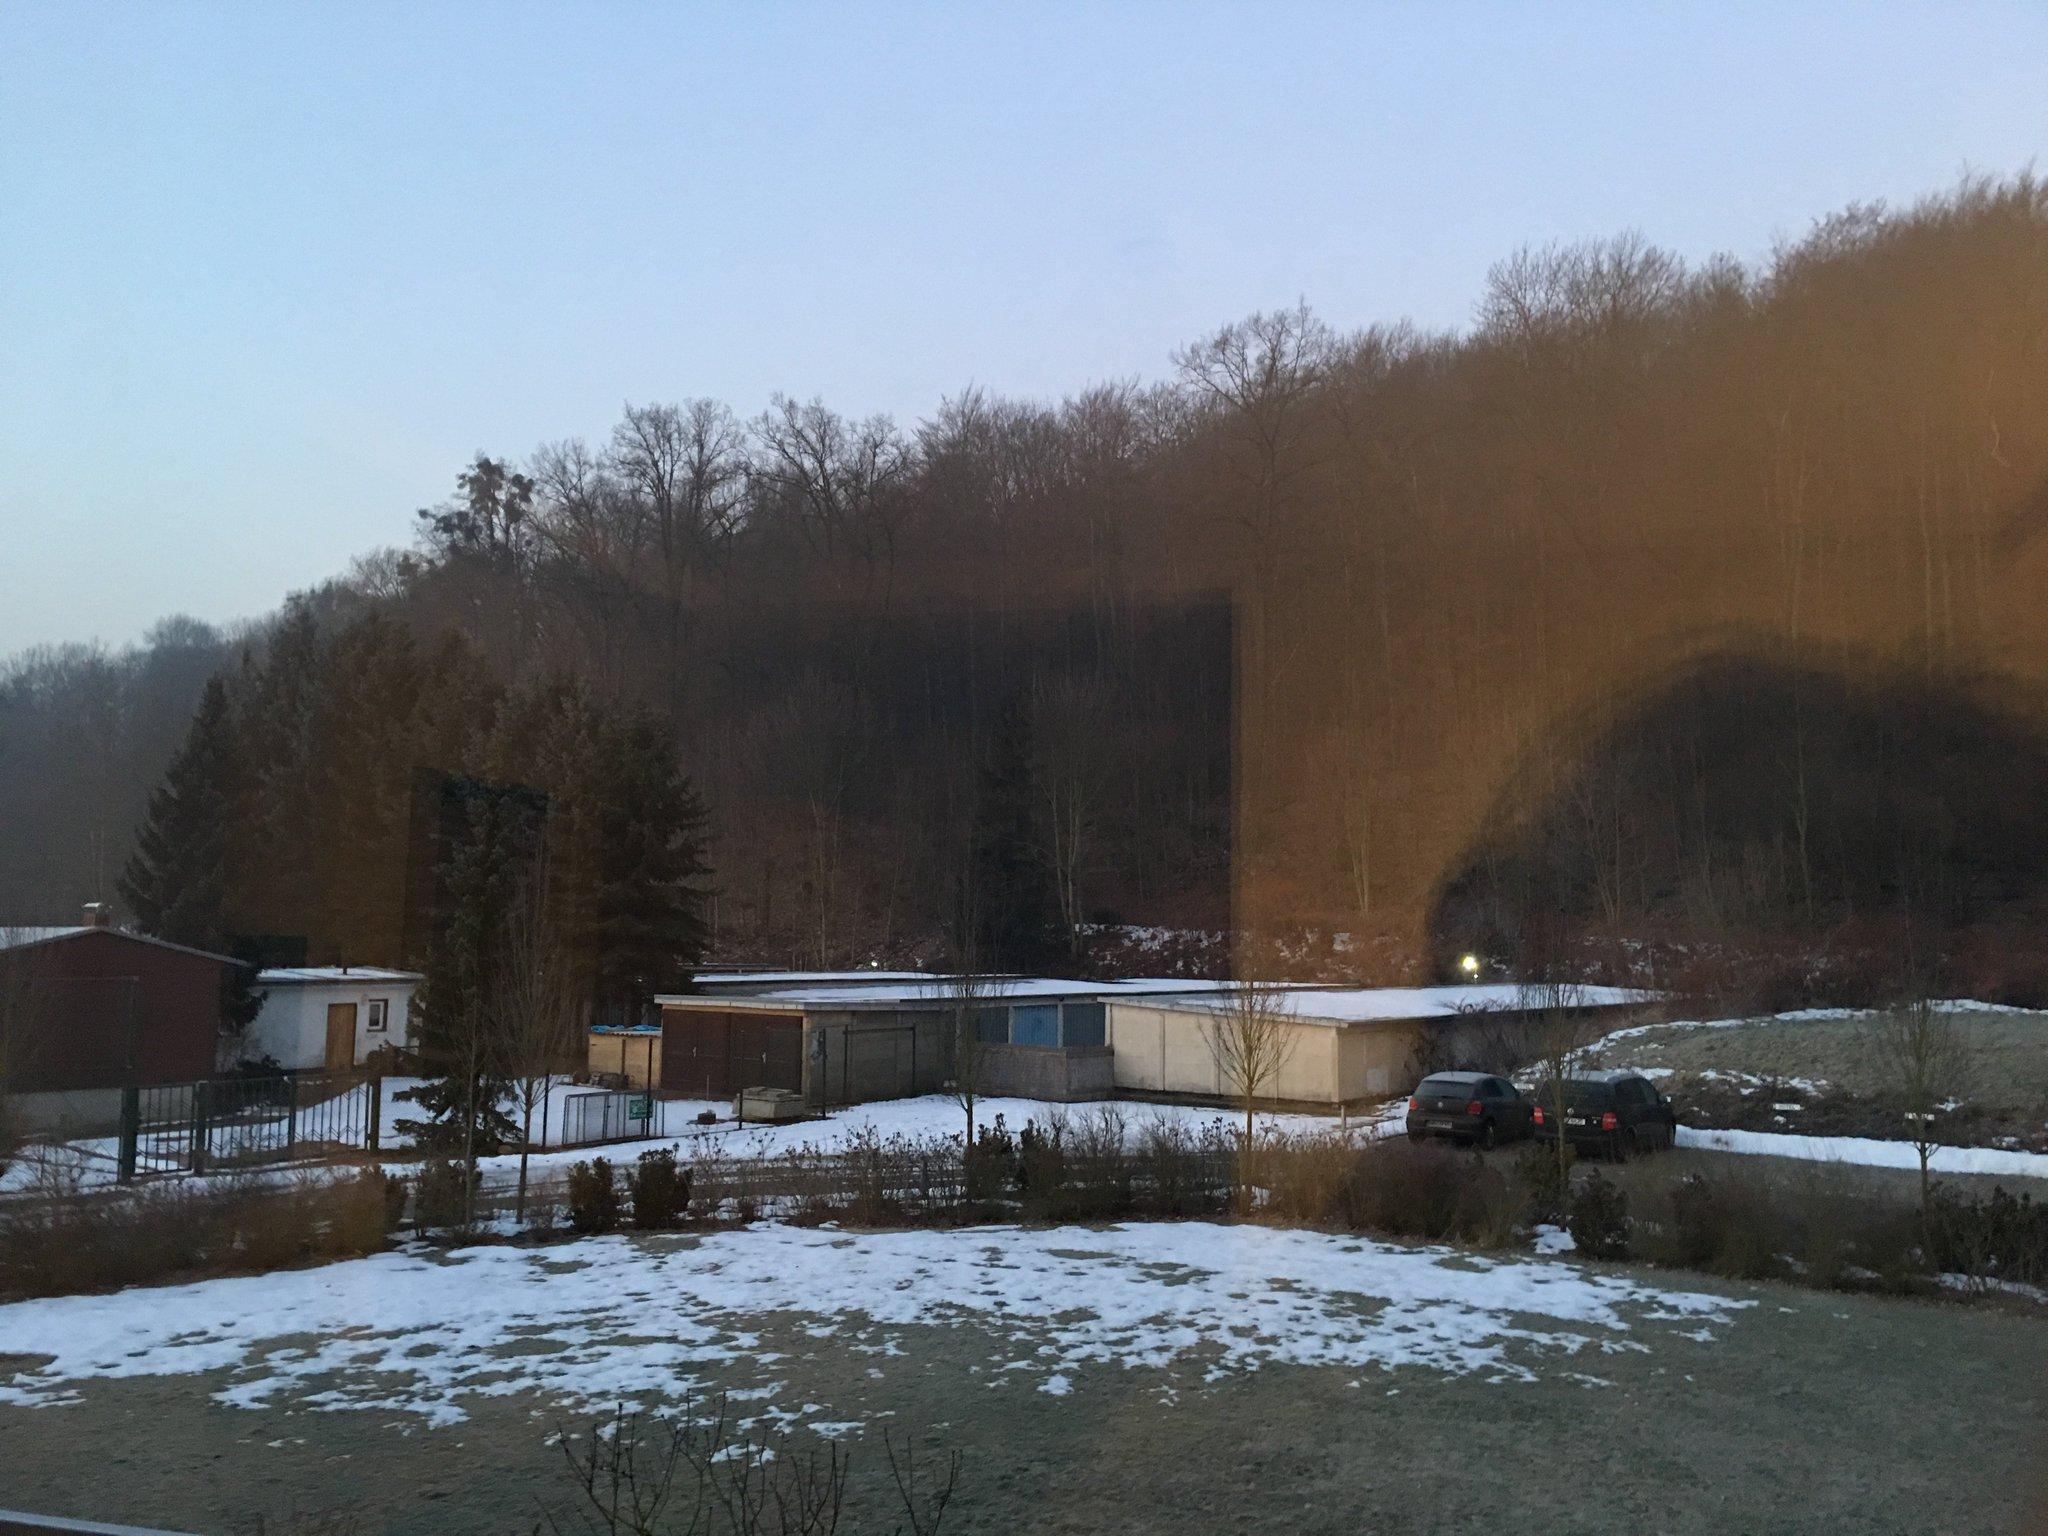 Guten Morgen aus dem akrivHotel in Pirna #saechsischeschweiz #meurers https://t.co/p4PZWSQuVg